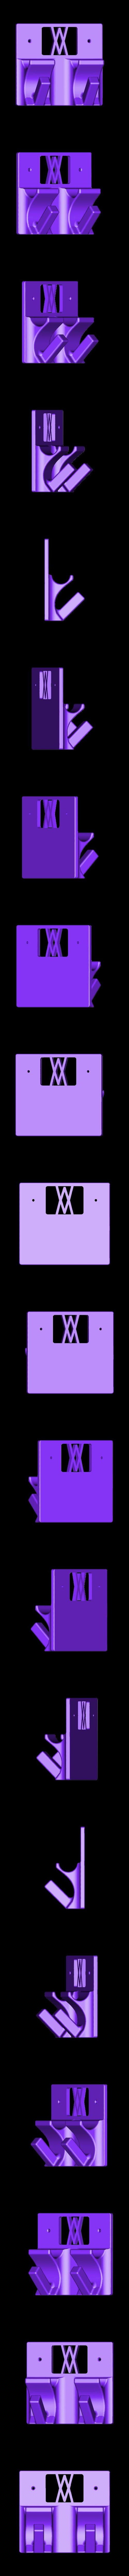 015_screws.stl Download free STL file Telescopic Wheel nut Wrench Set 4 pcs. Tool Holder 015 I for screws or peg board • 3D printing template, Wiesemann1893